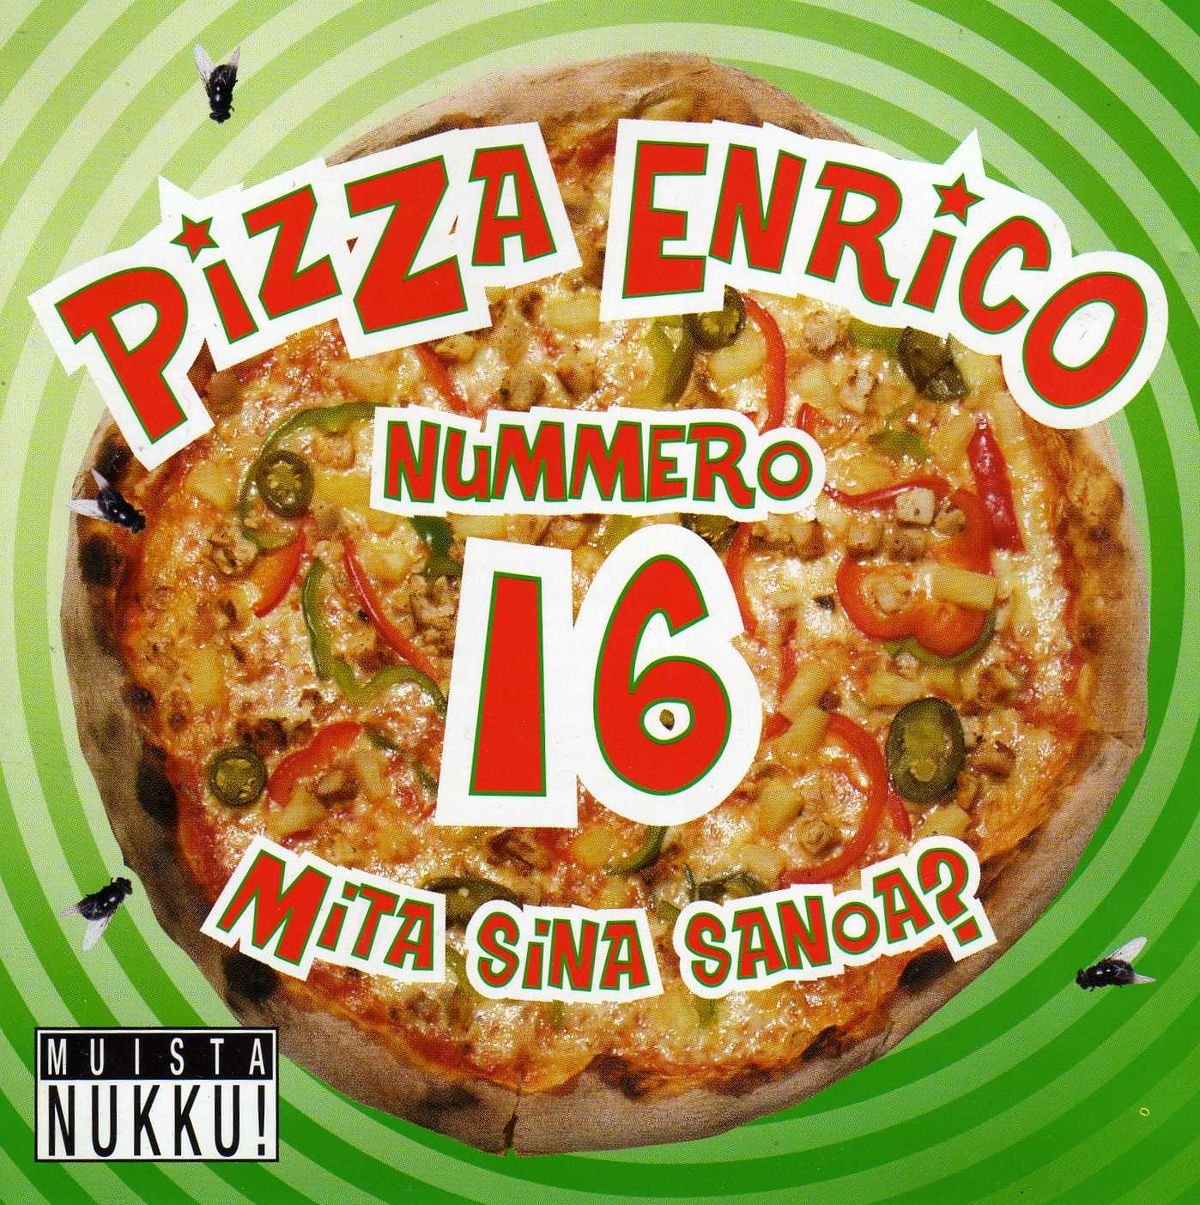 Mita sina sanoa wikipedia for En 3 pizzas te olvido